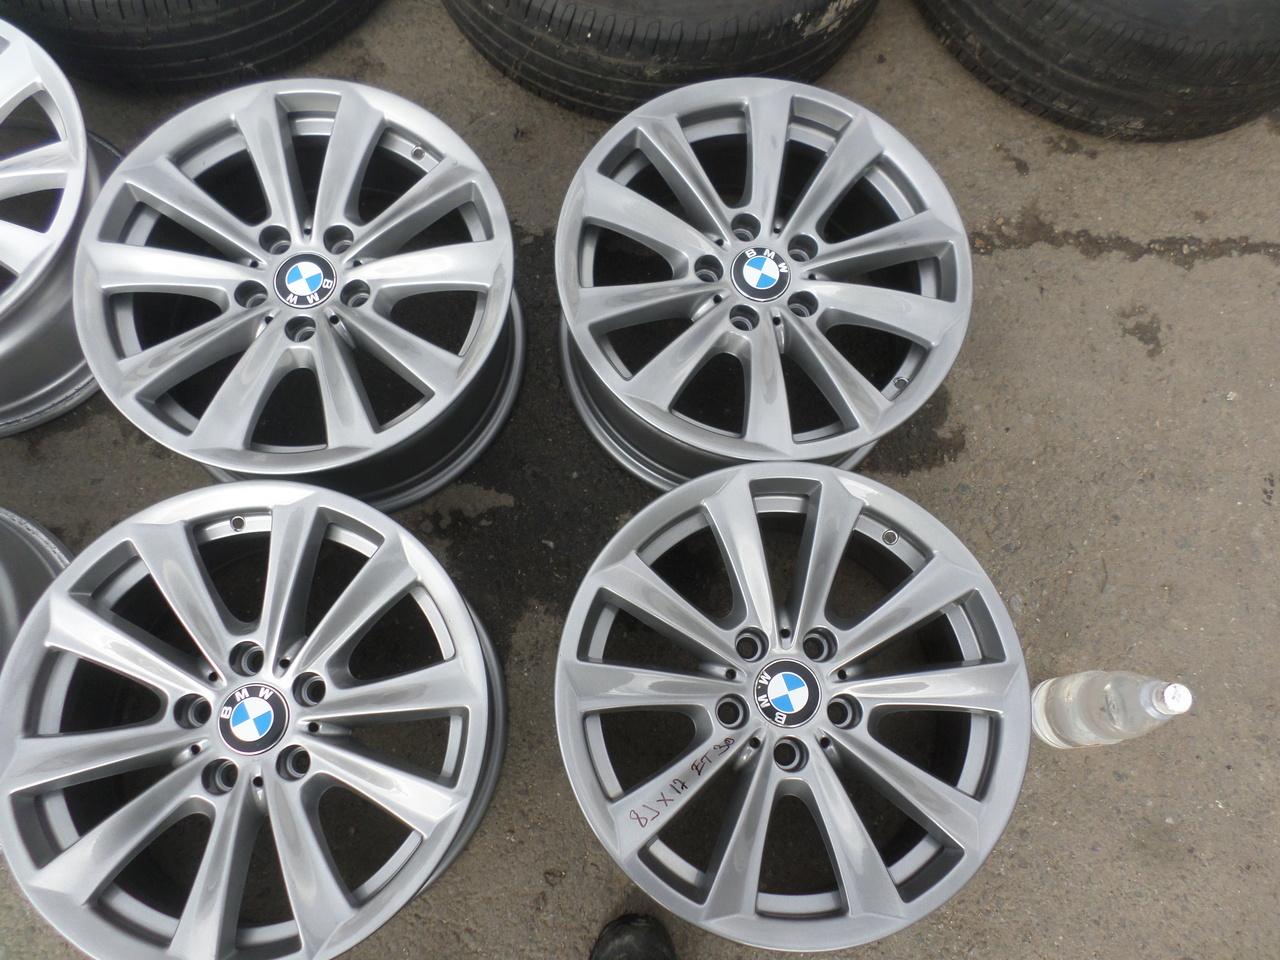 Jante BMW Seria 5 F10 F11 Iarna Vara 225 55 17